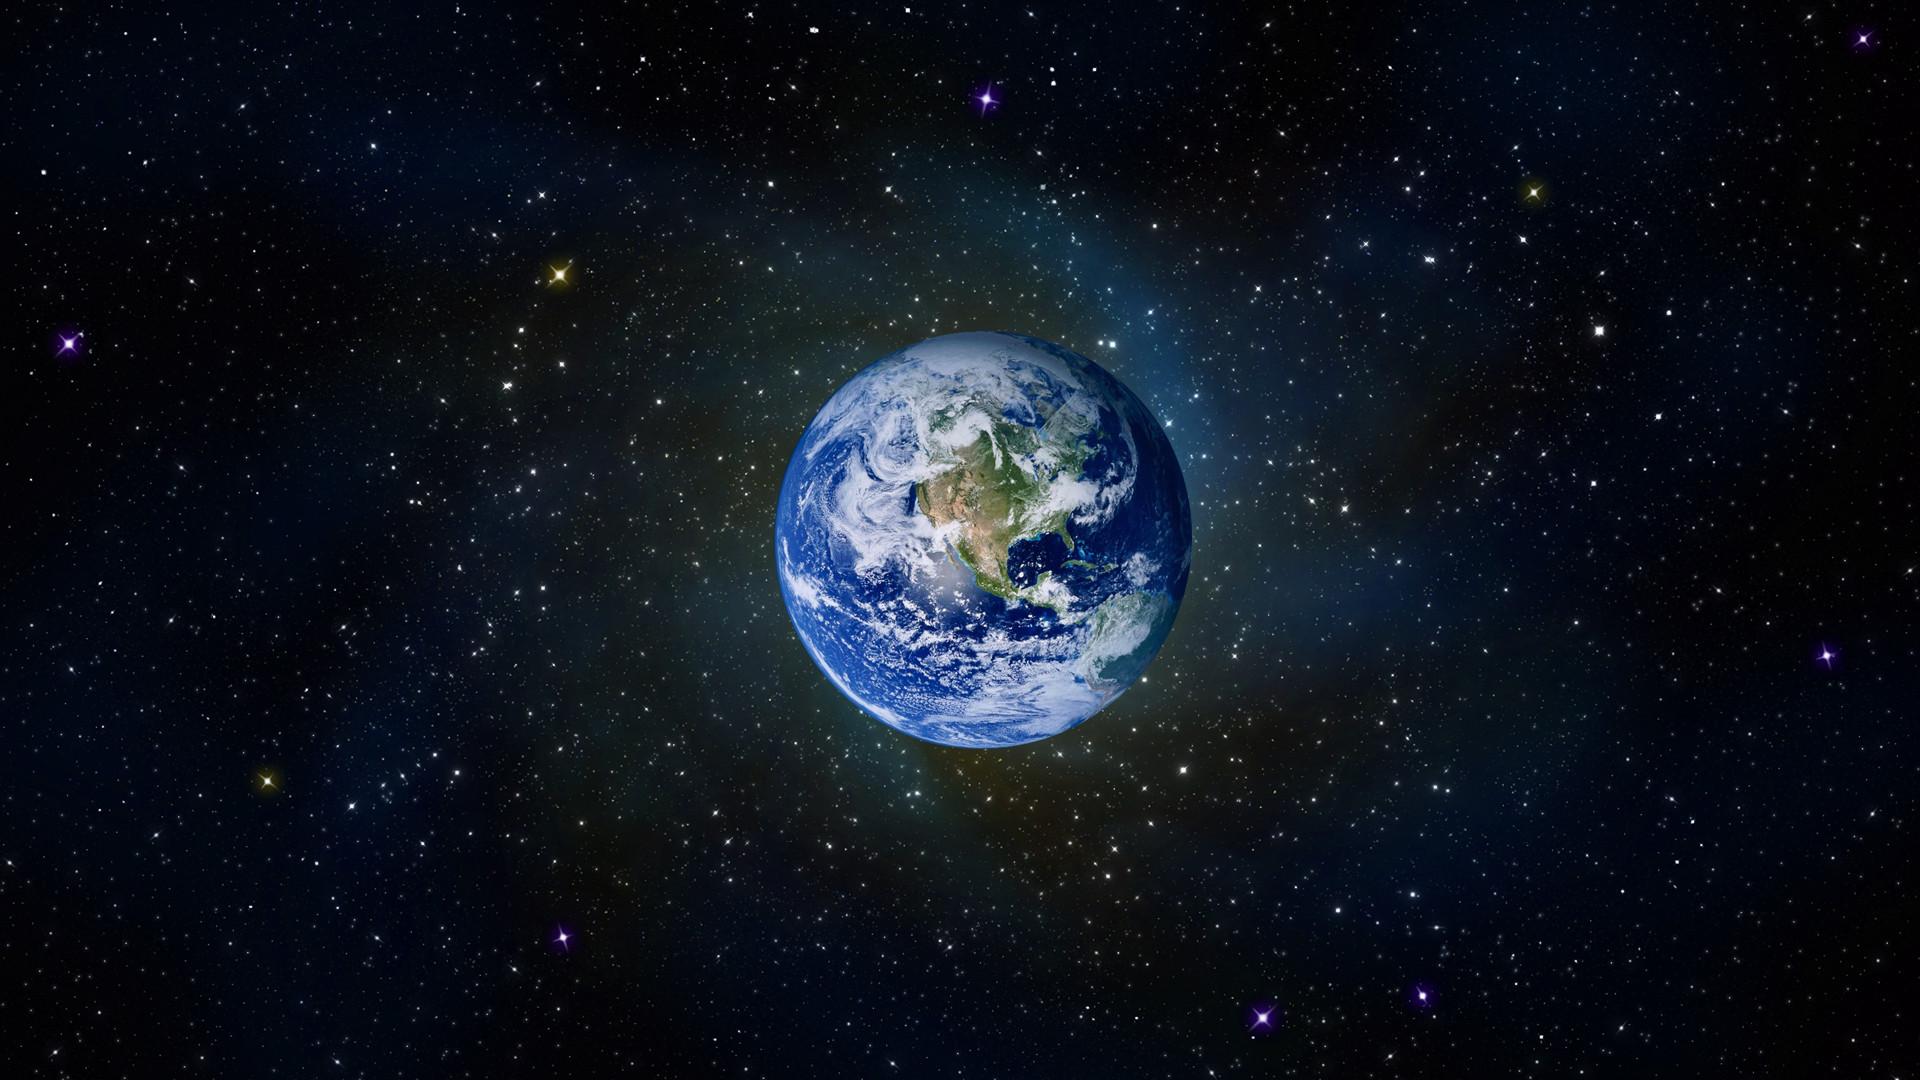 Homepage » Space » Space HD wallpaper (29)